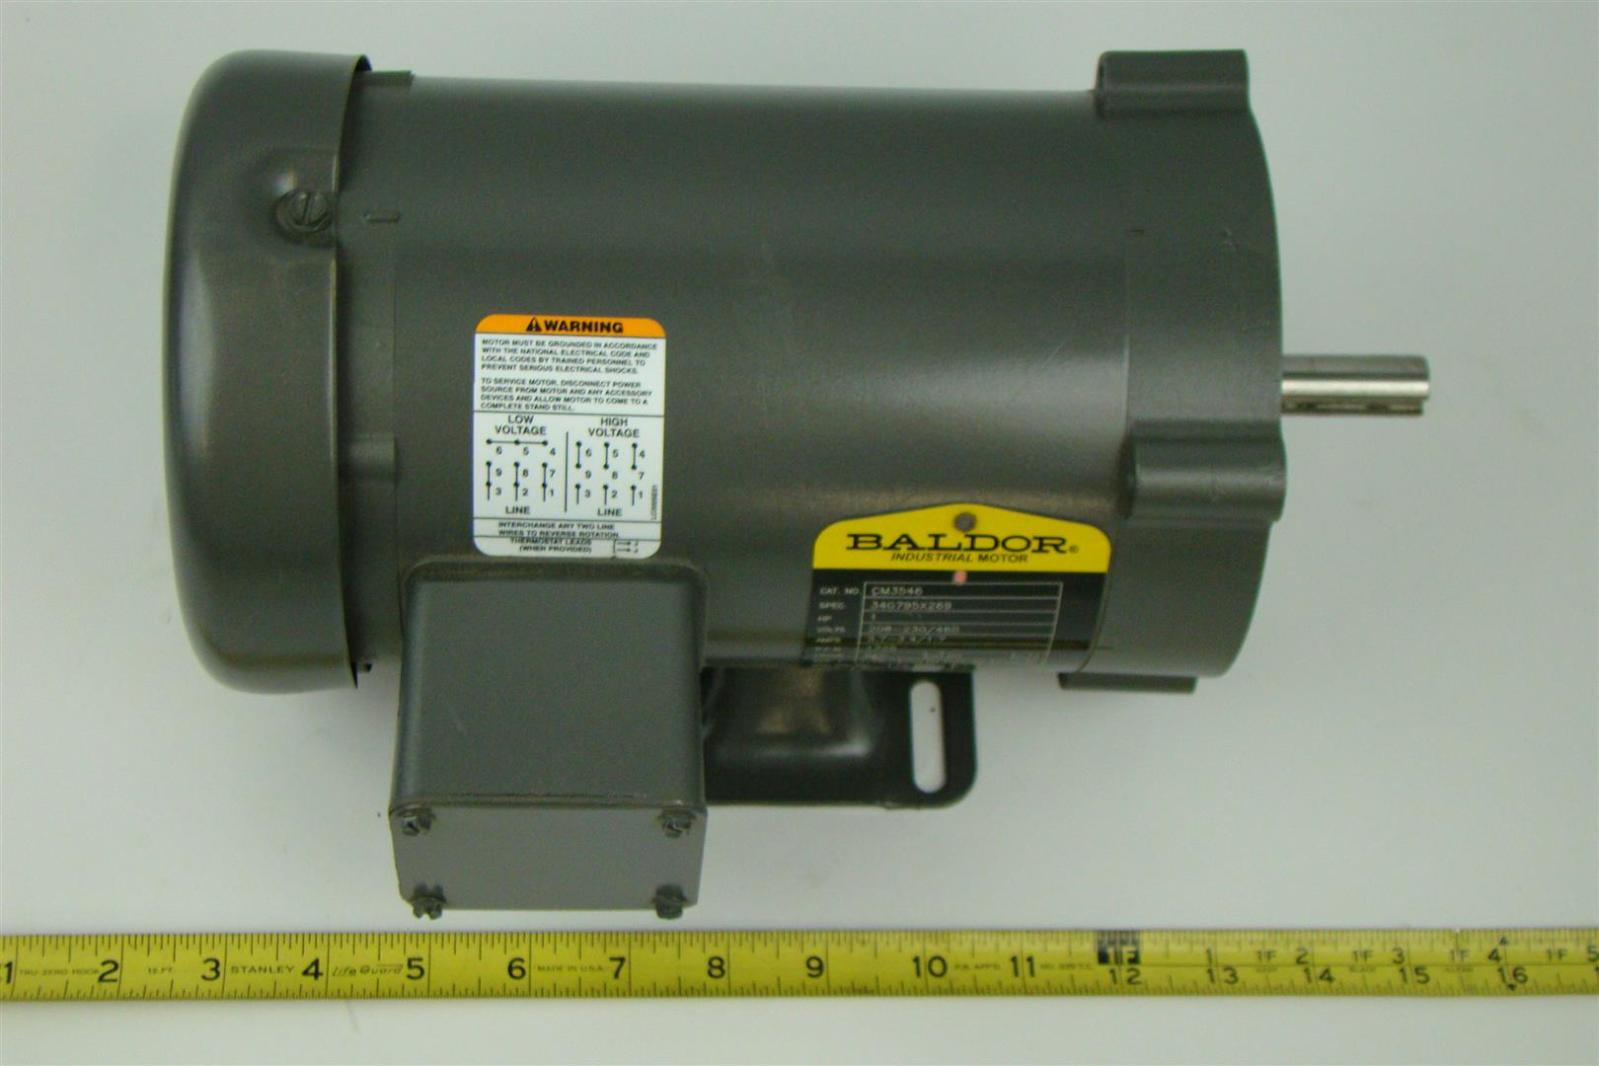 Baldor industrial motor 1hp 230 460v 3 4 1 7a 1725rpm 3ph Baldor industrial motor pump